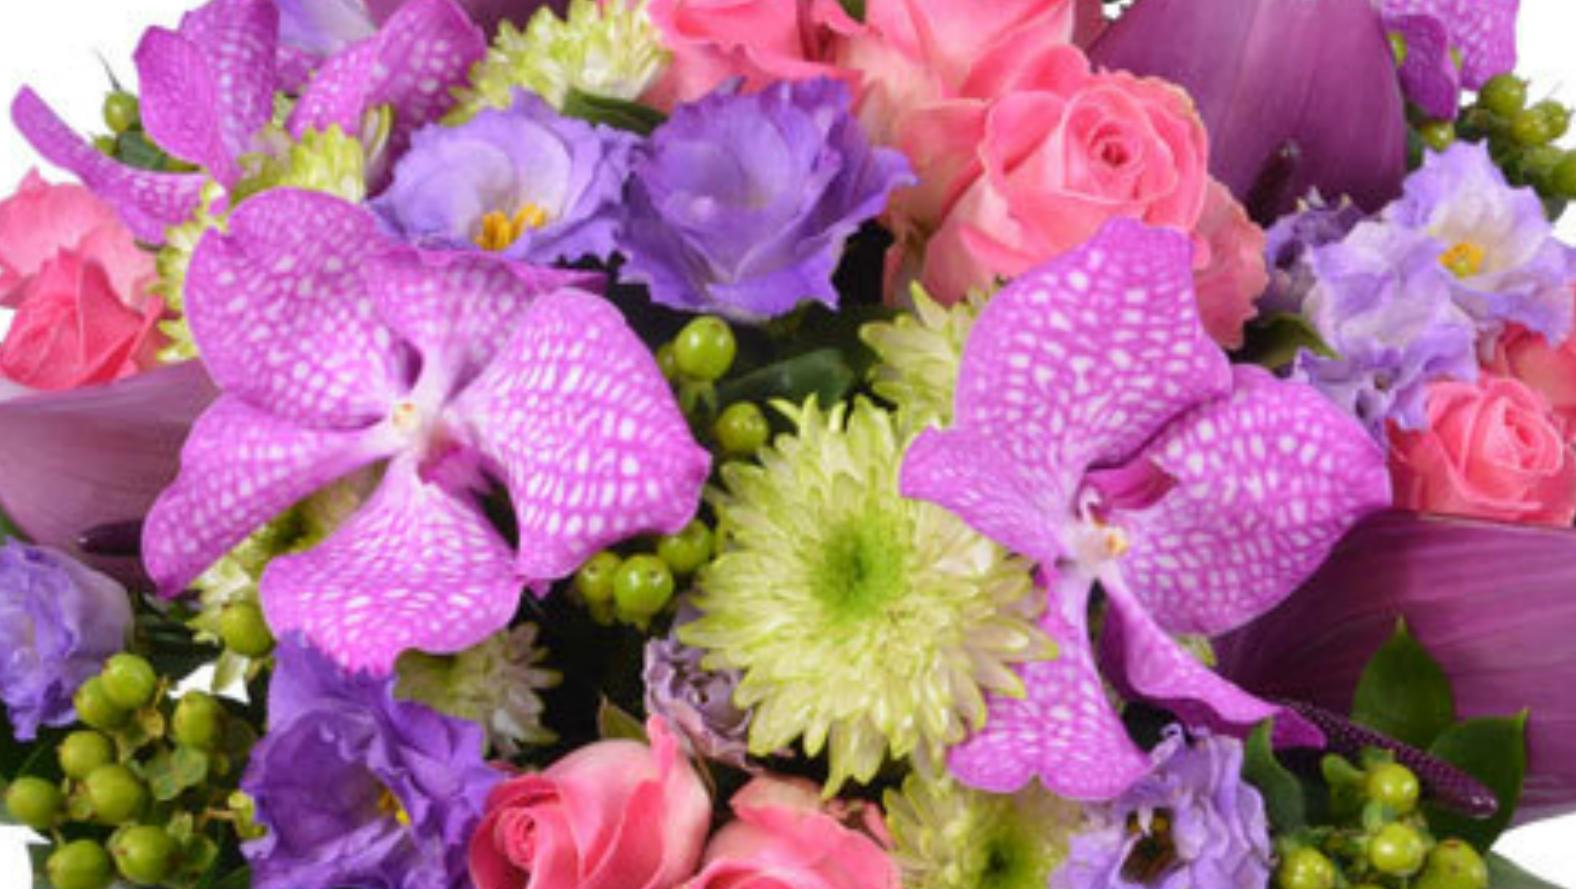 Bouquet dexception france flower station luxury orchids izmirmasajfo Choice Image